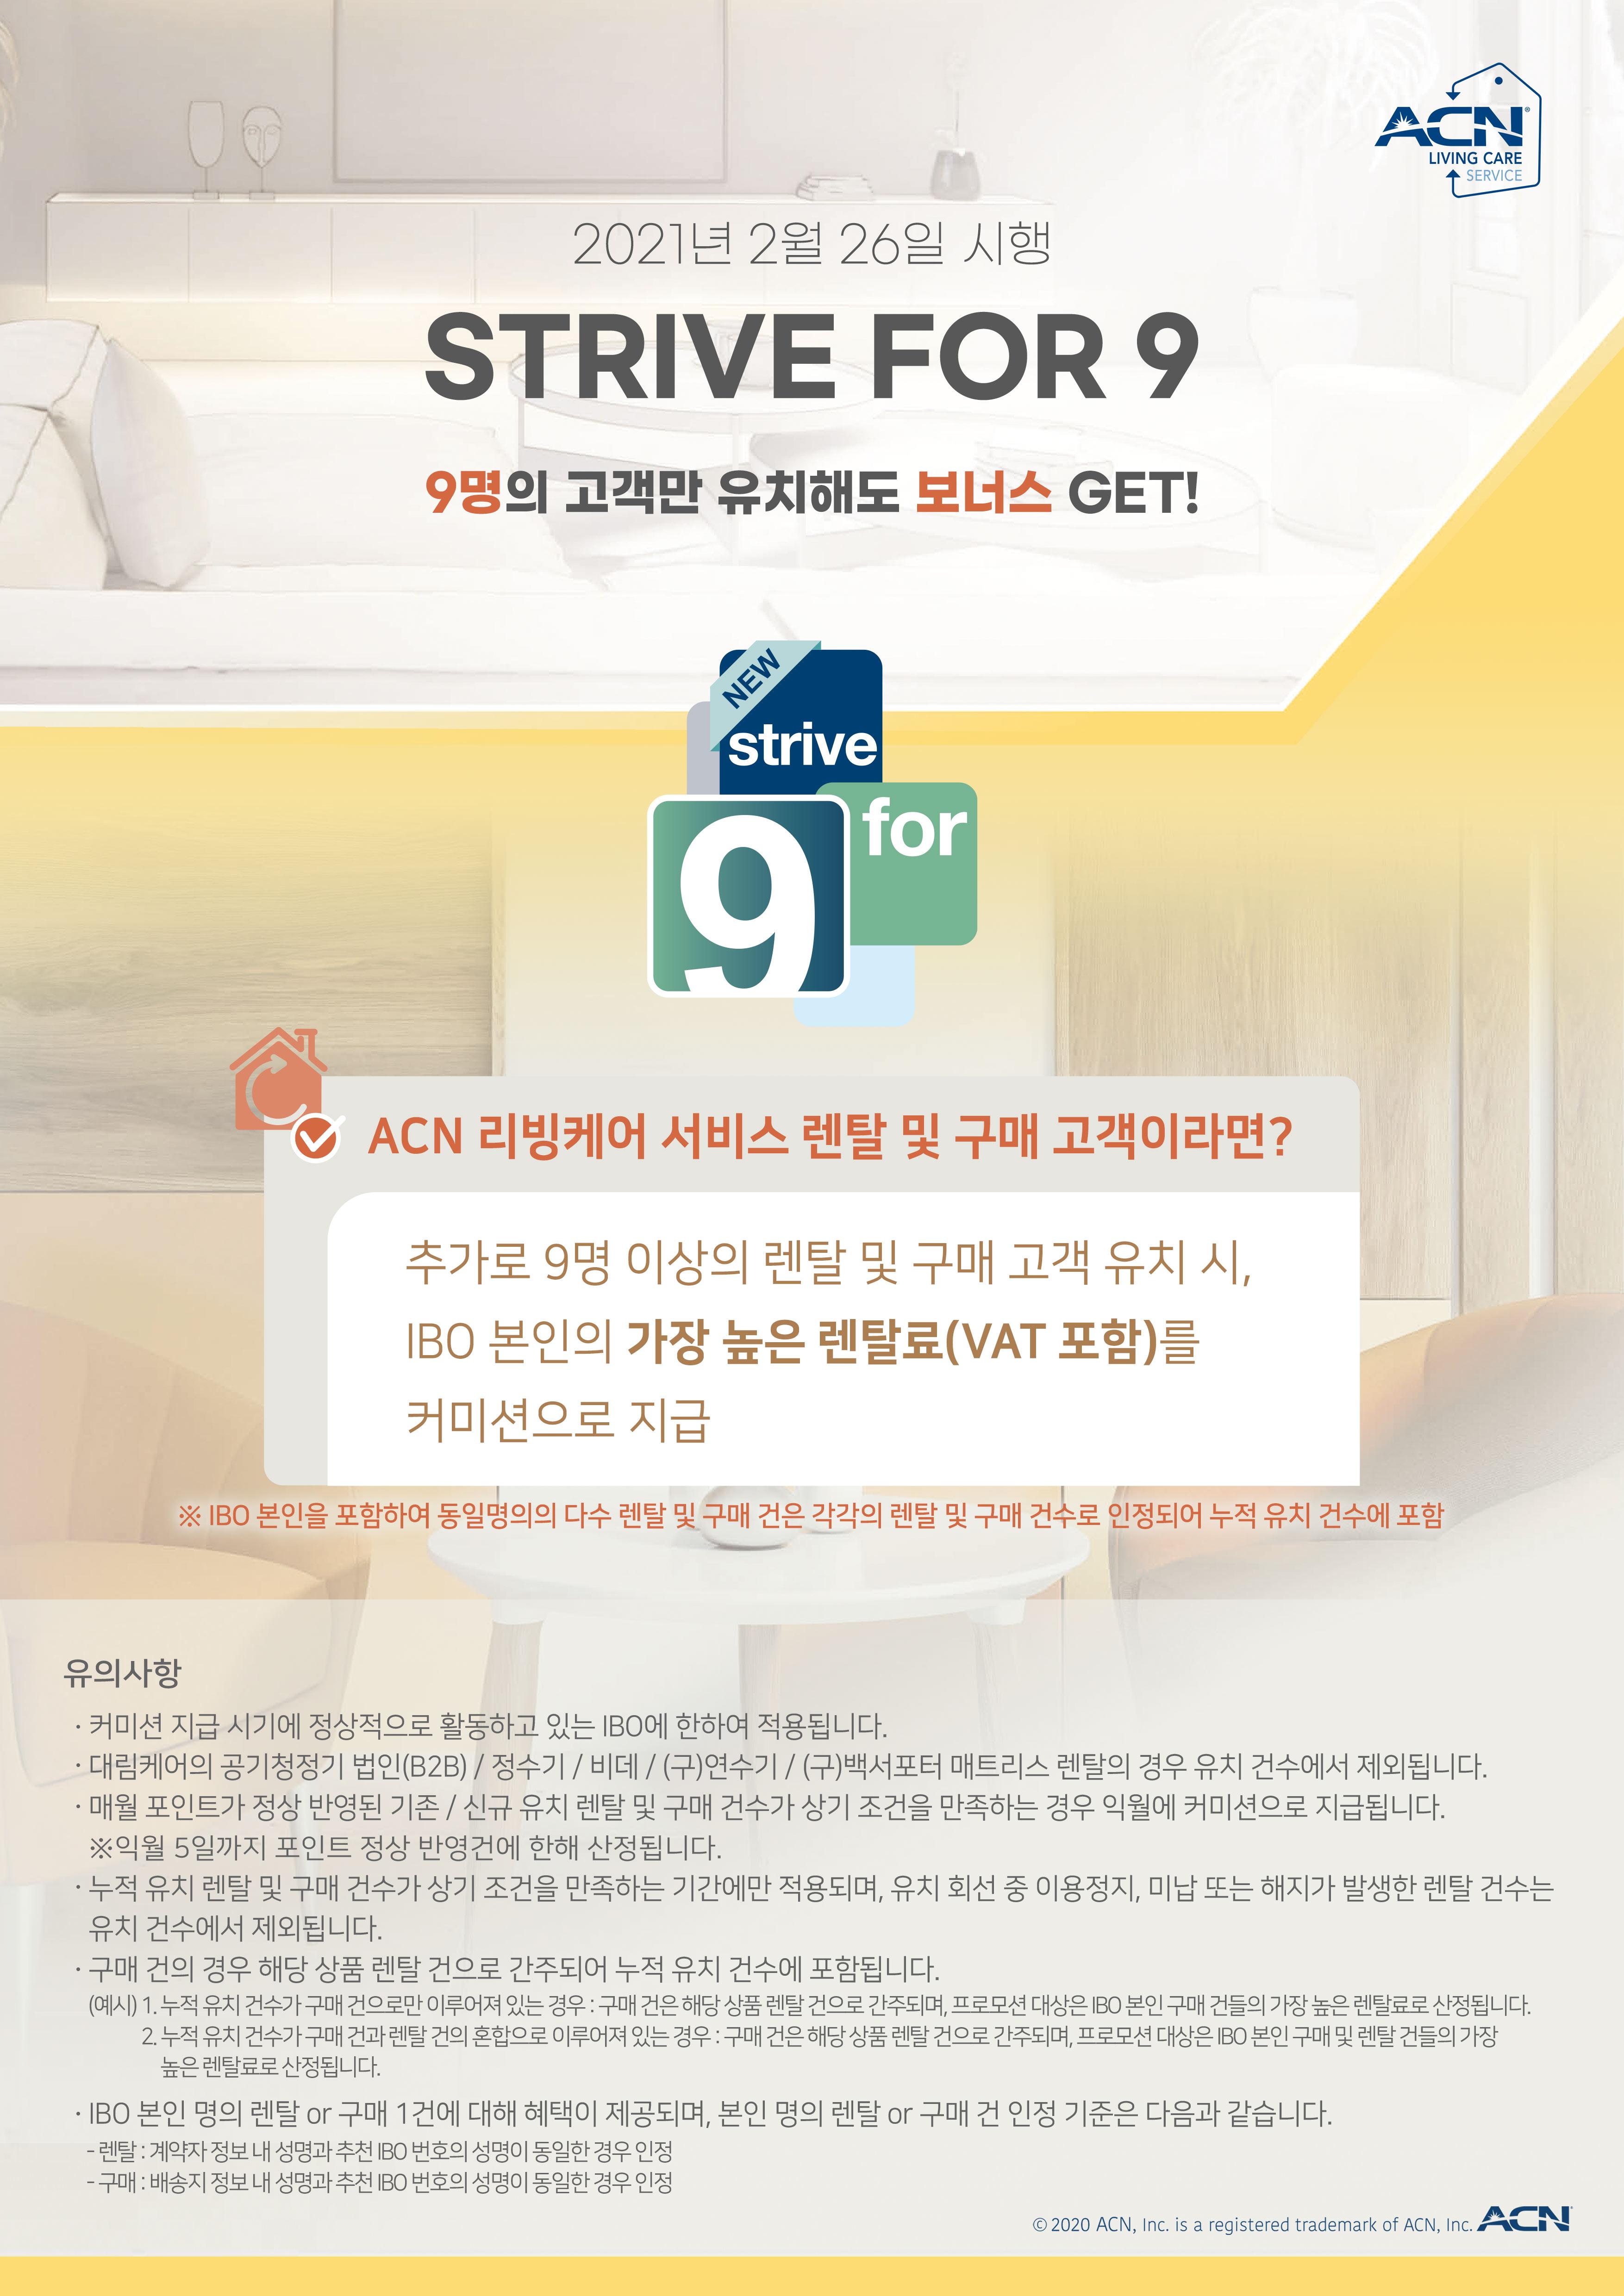 ACN 리빙케어 서비스 Strive for 9 - 2021년 2월 25일 시행